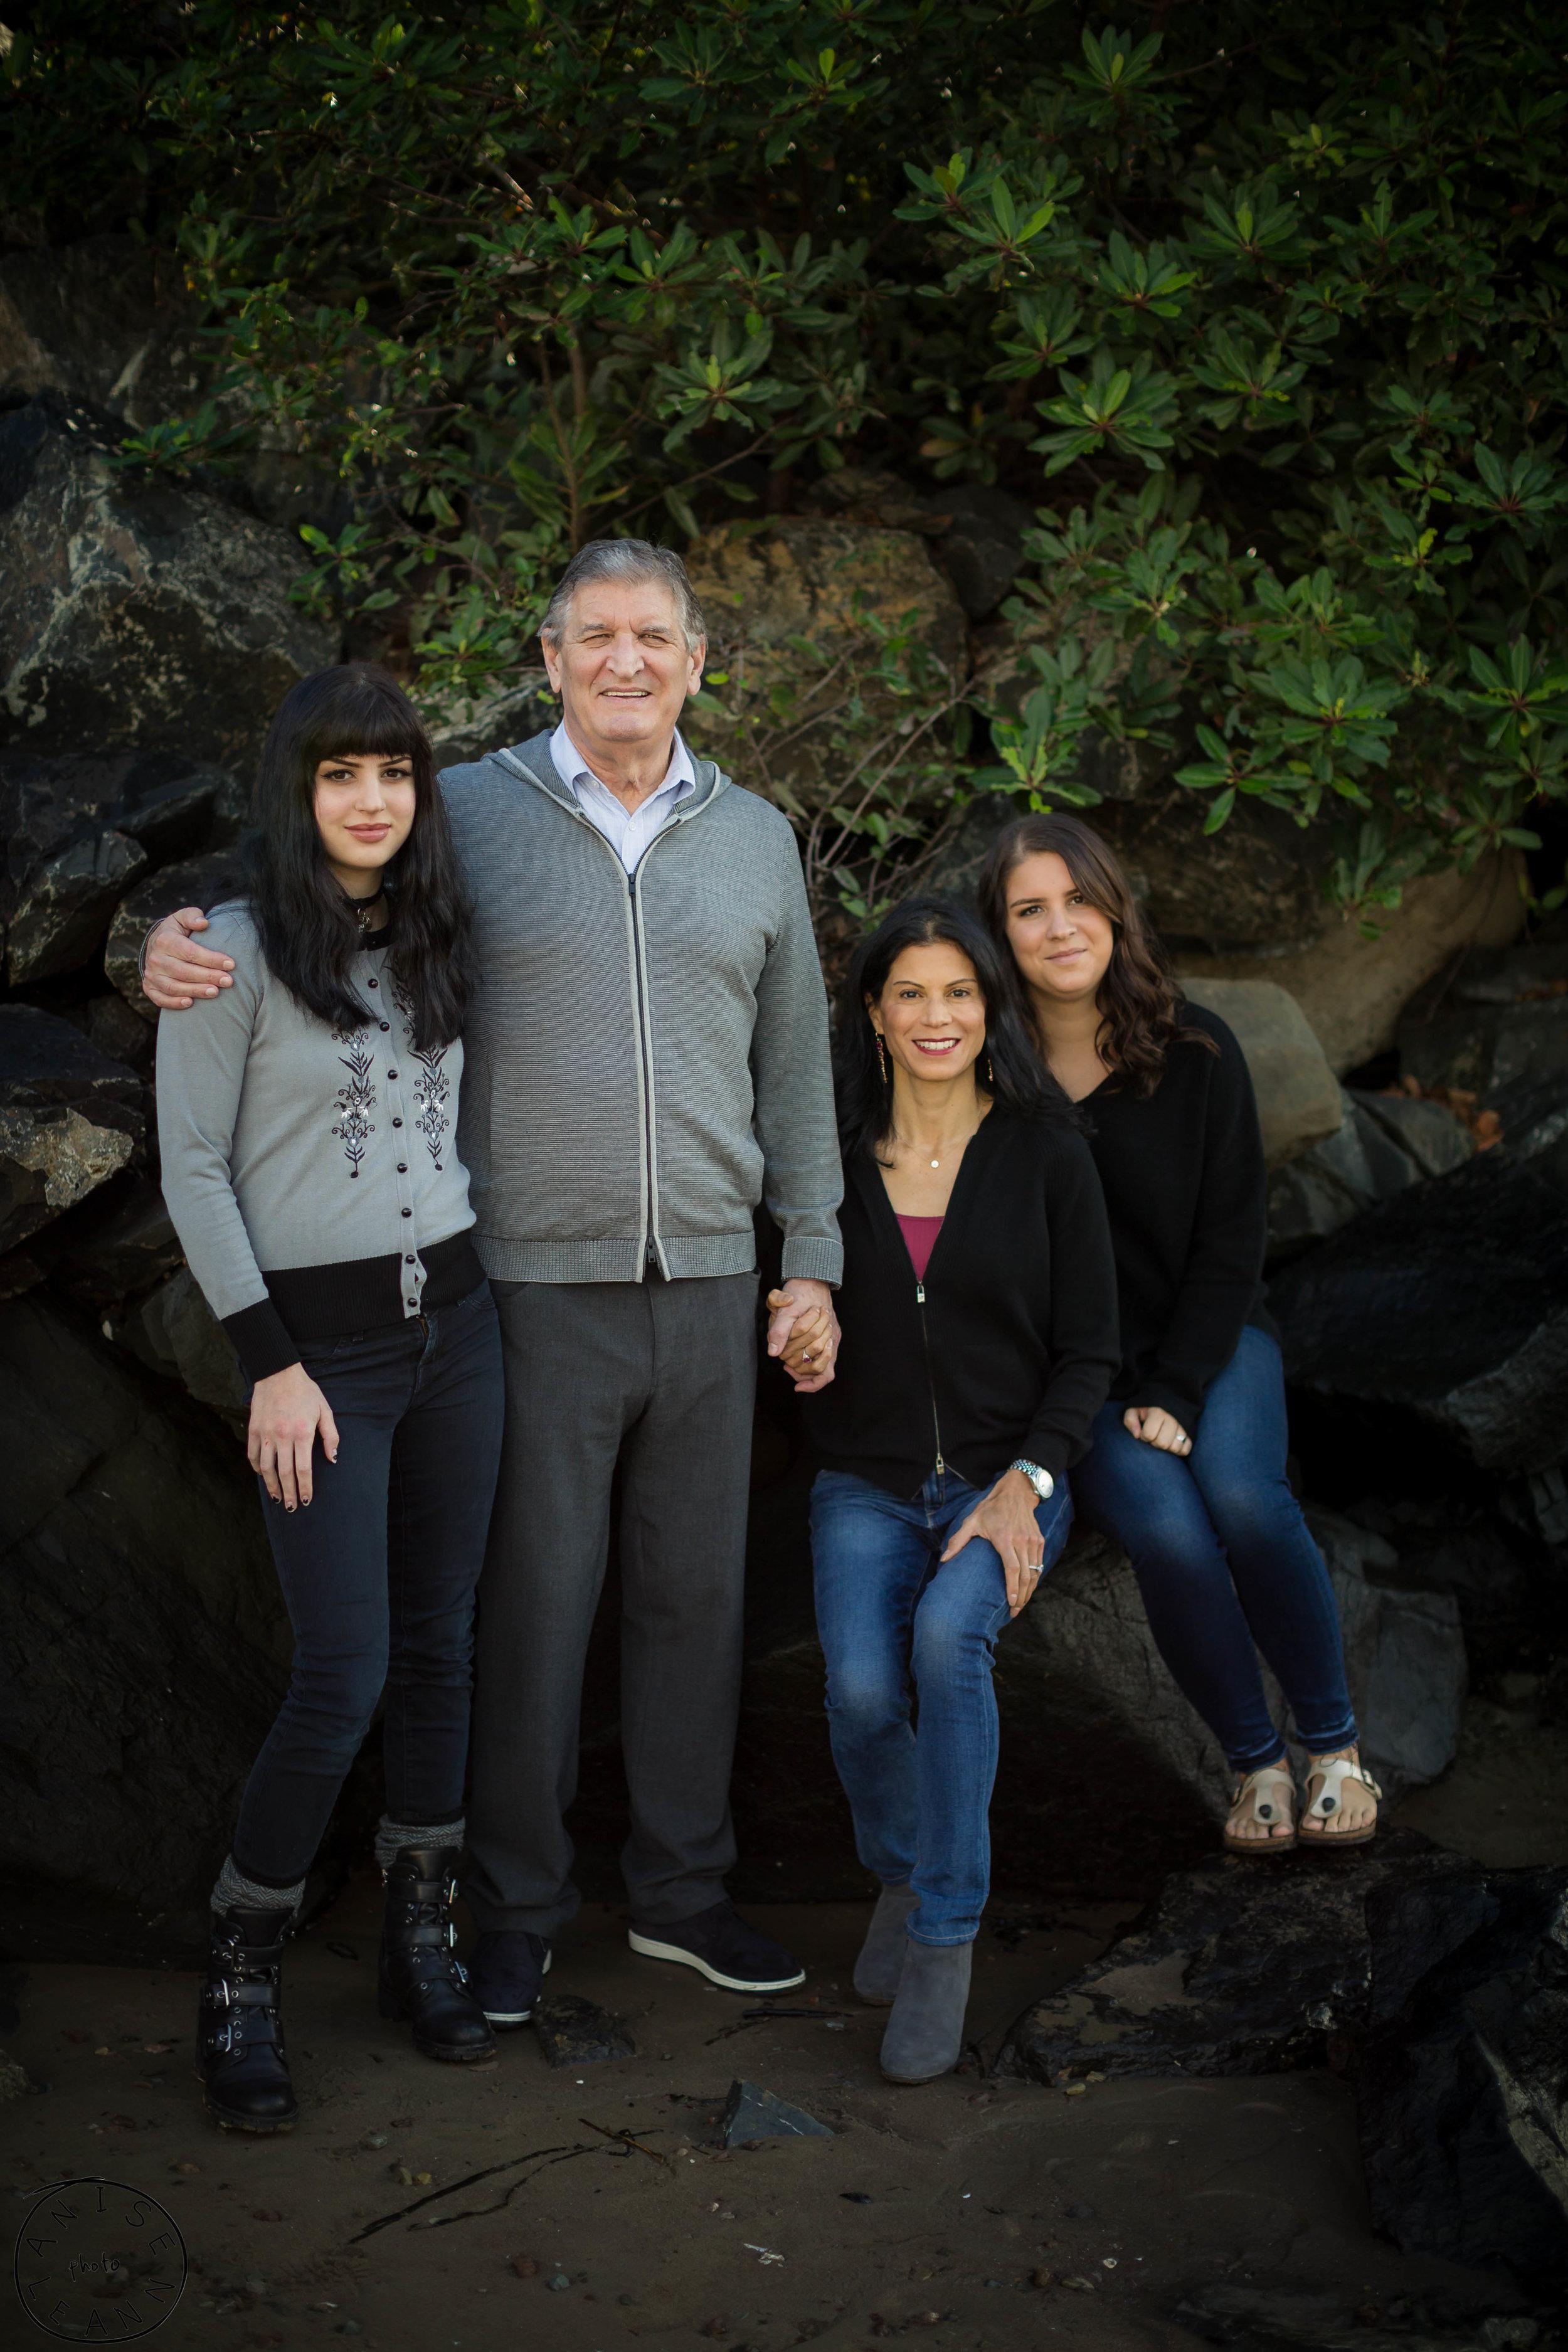 Family Portraits Cavallo Point